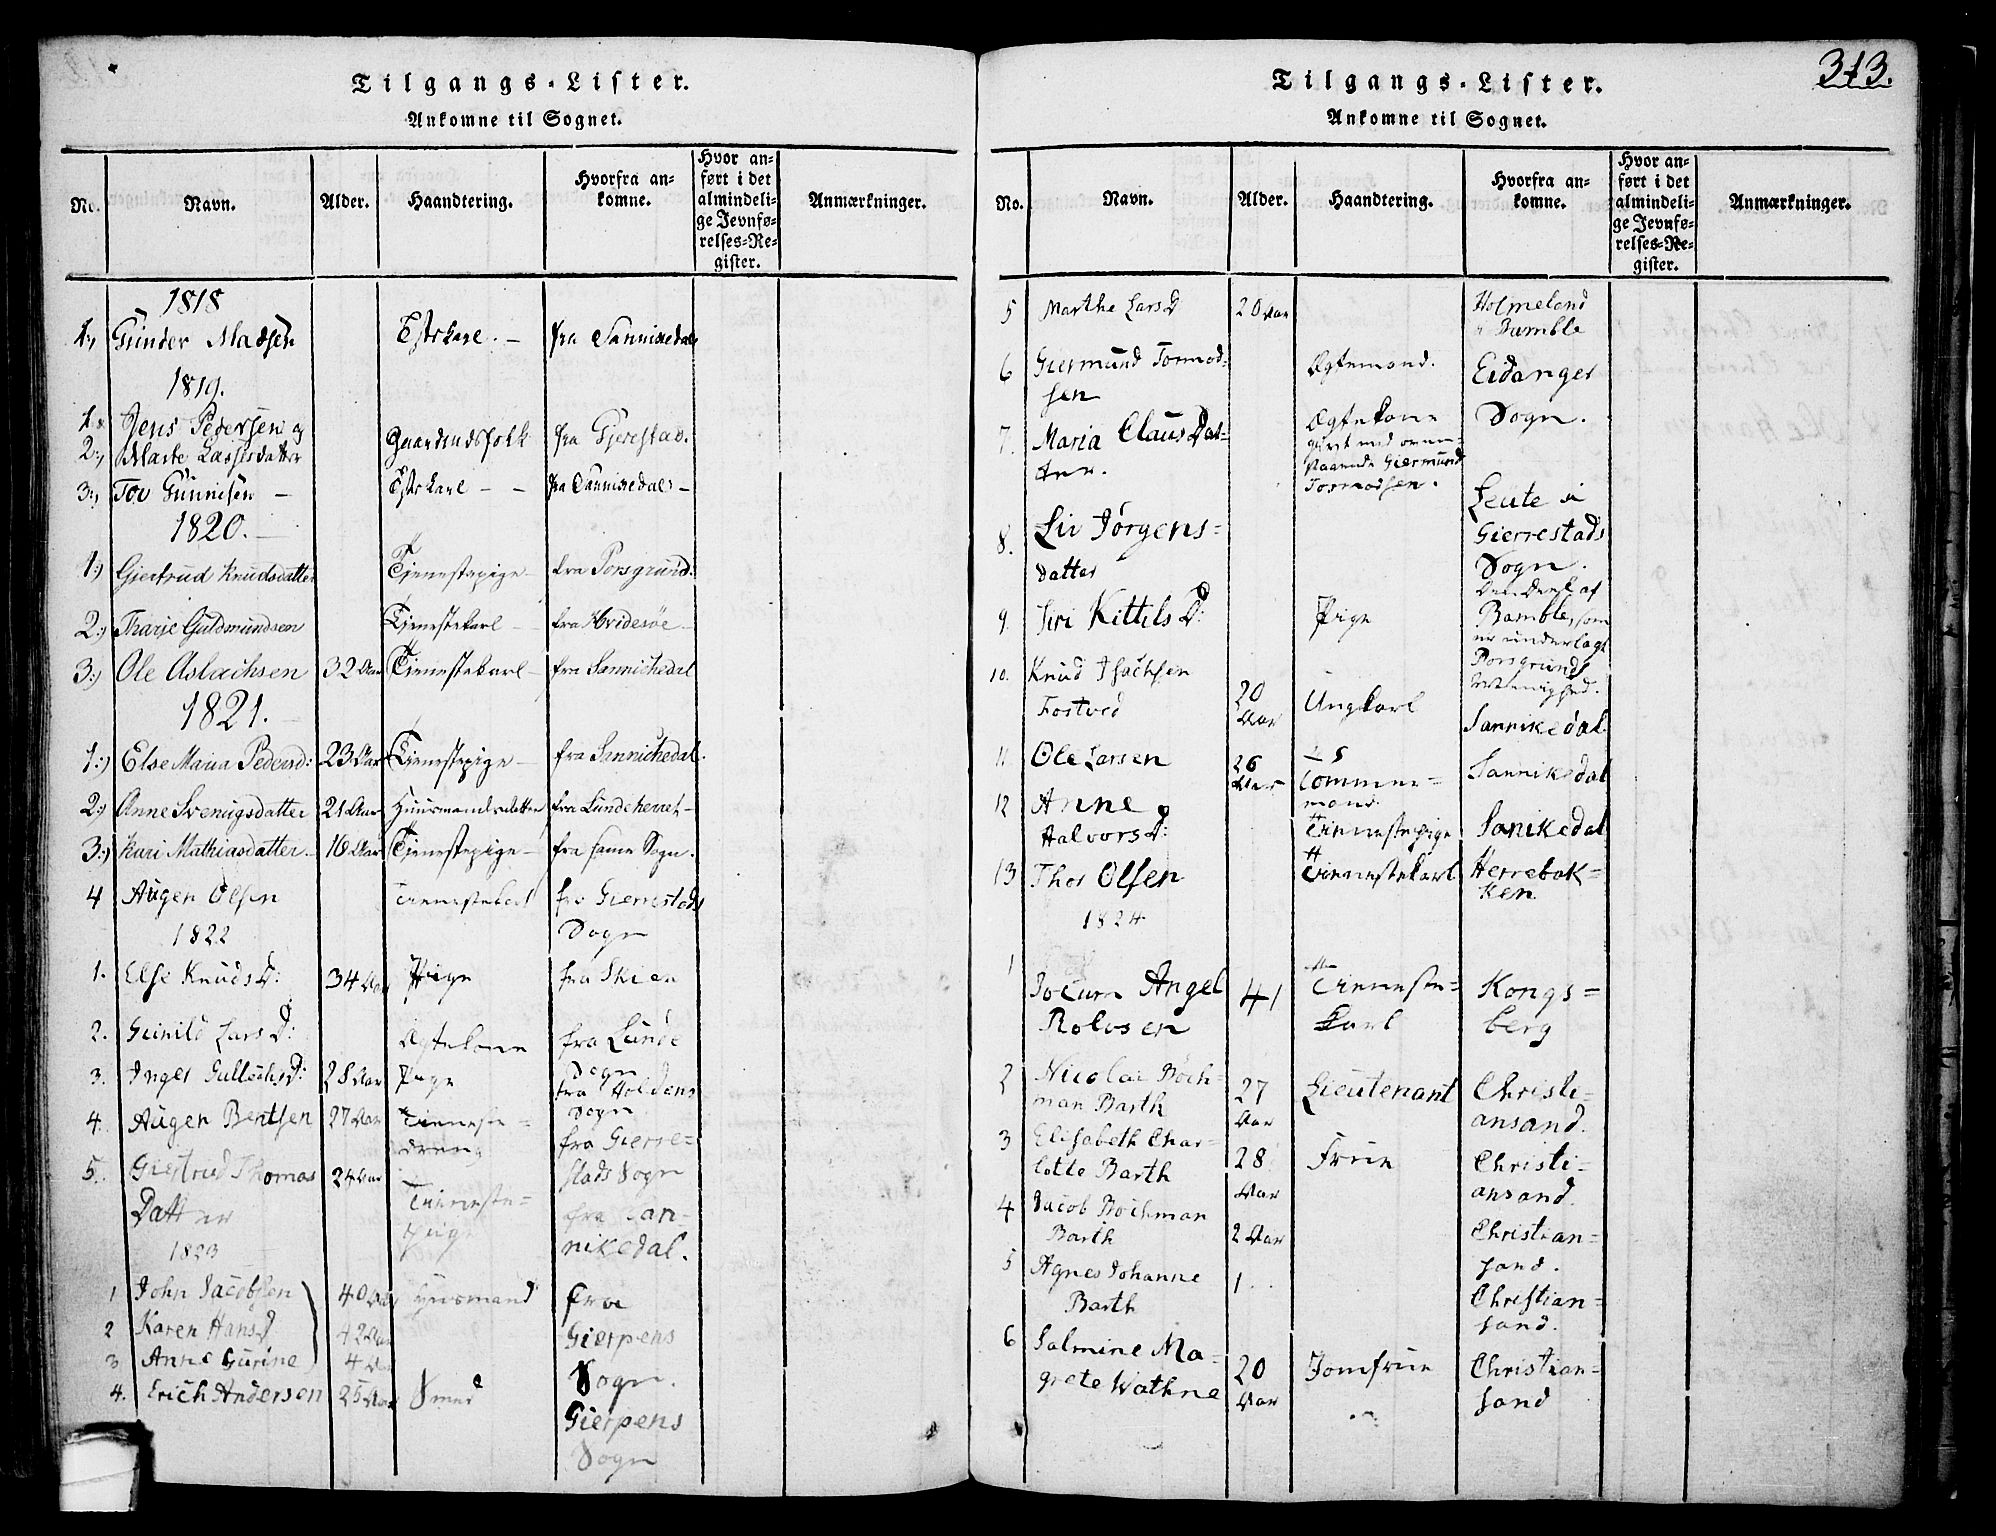 SAKO, Drangedal kirkebøker, F/Fa/L0005: Ministerialbok nr. 5 /1, 1814-1831, s. 313